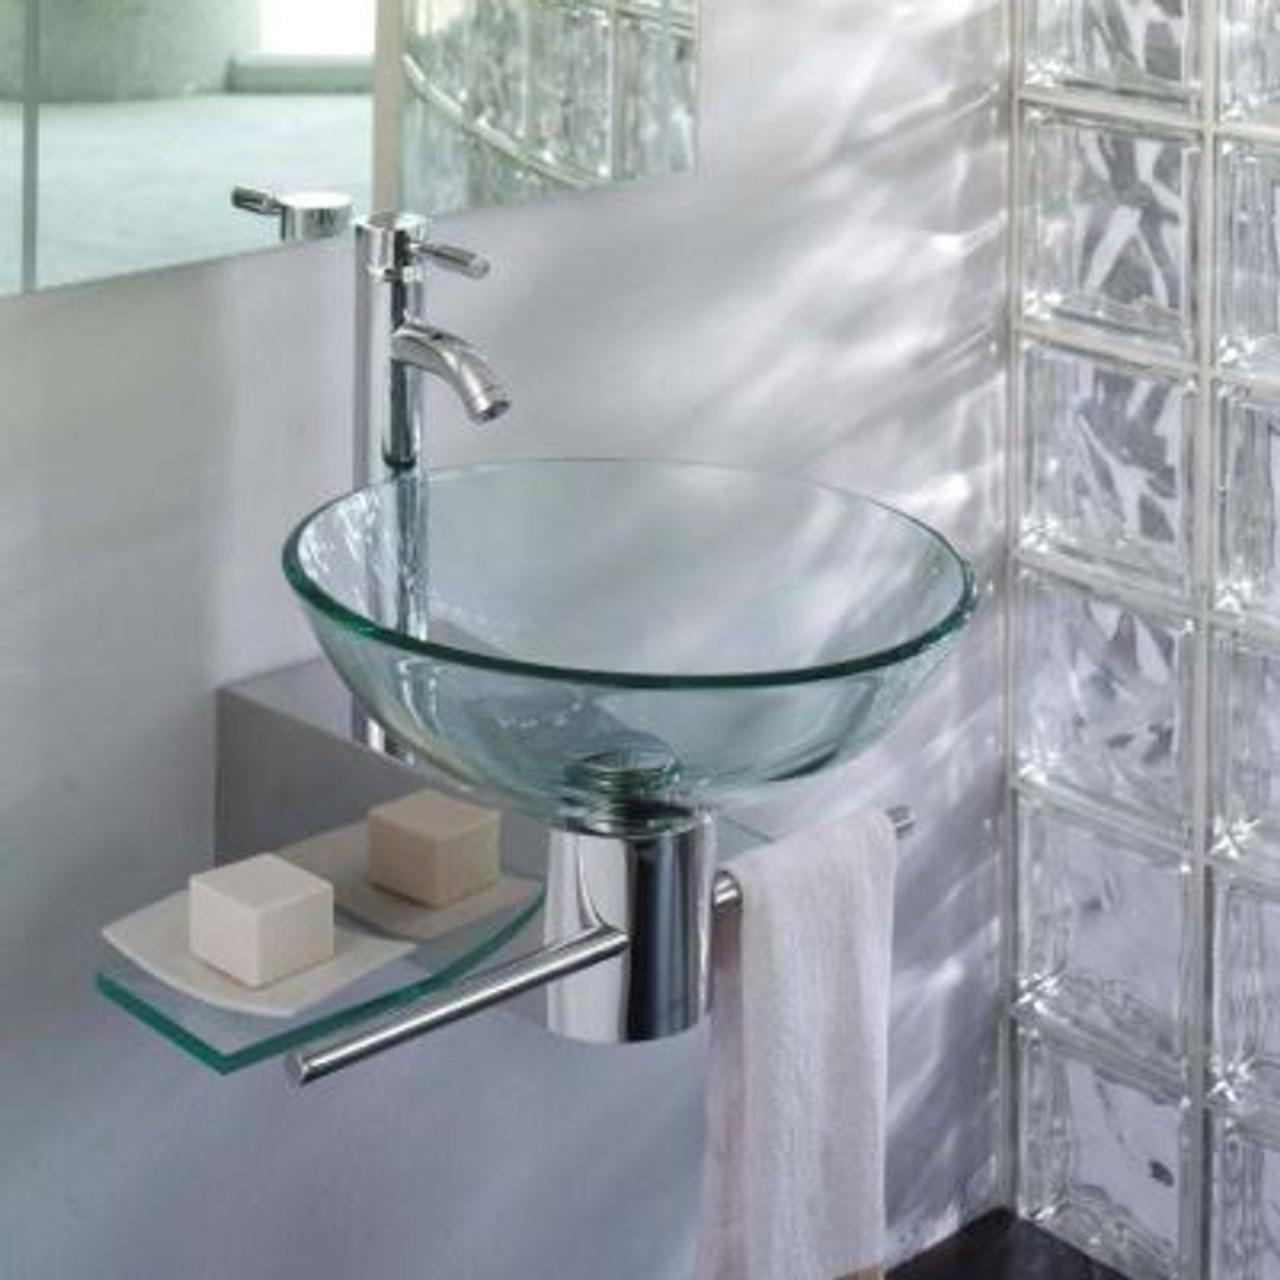 lv 002r lorixon small bathroom vanity glass bowl vessel sink combo set